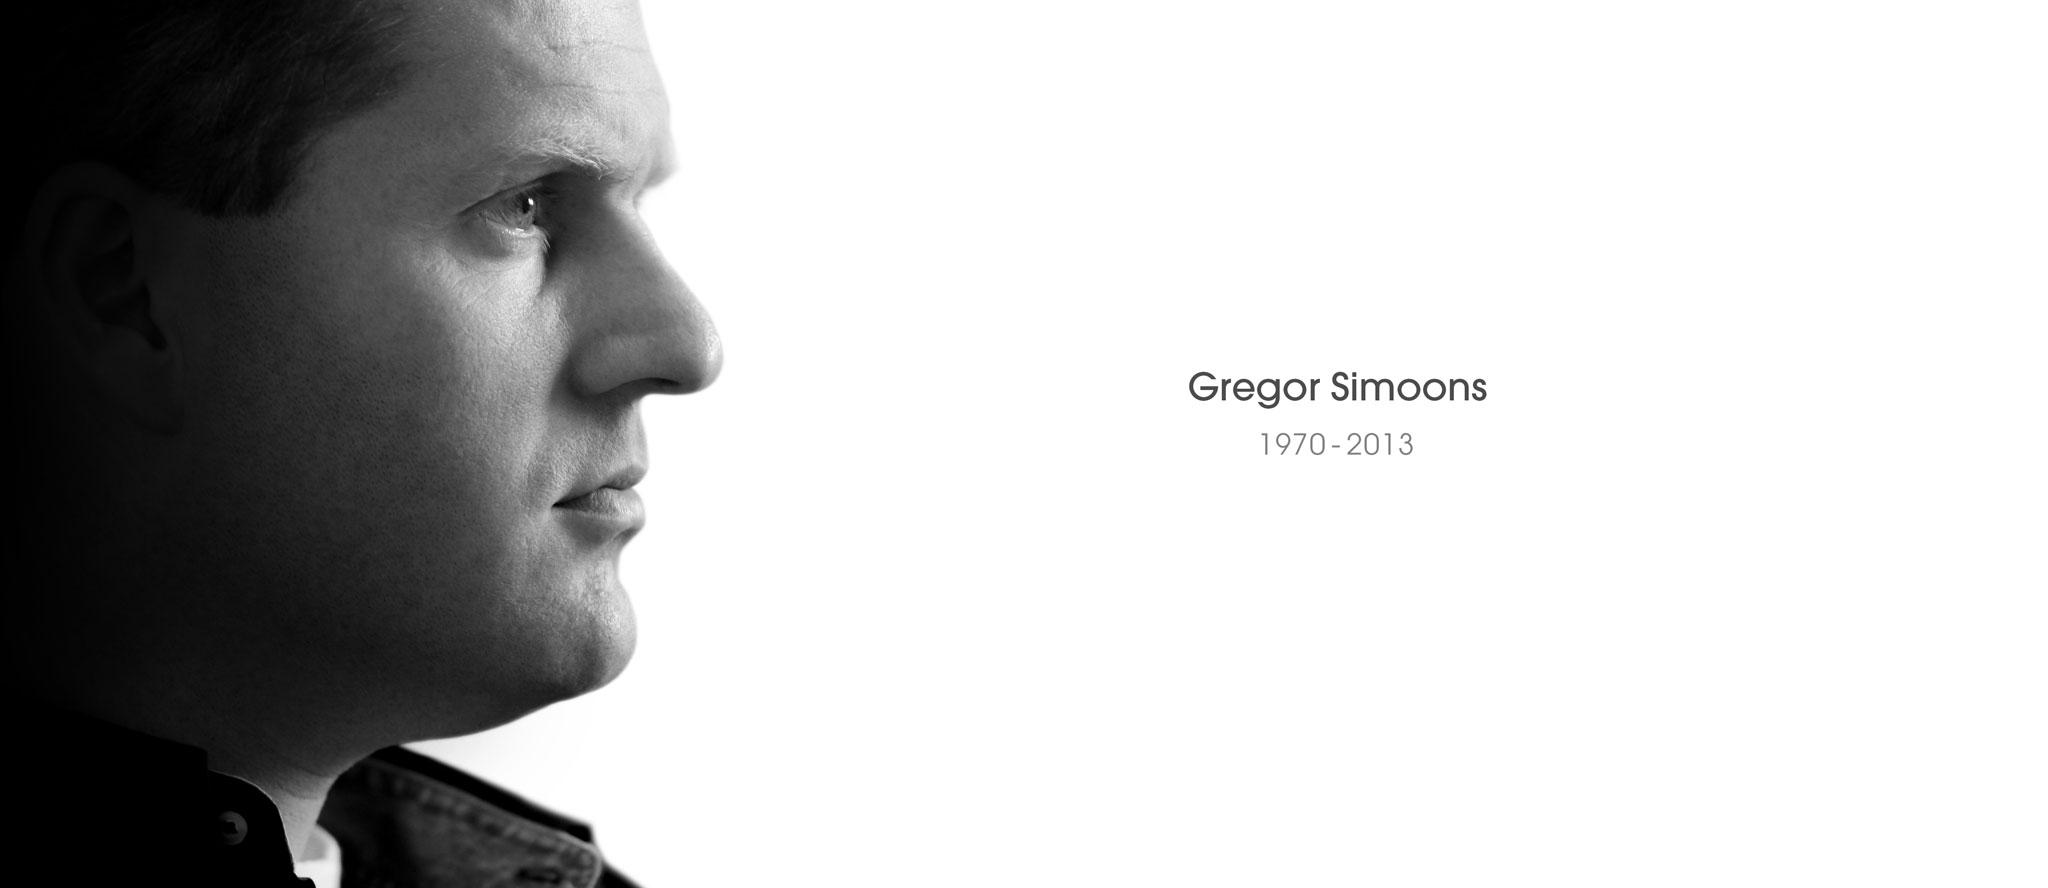 Gregor Simoons 1970-2013